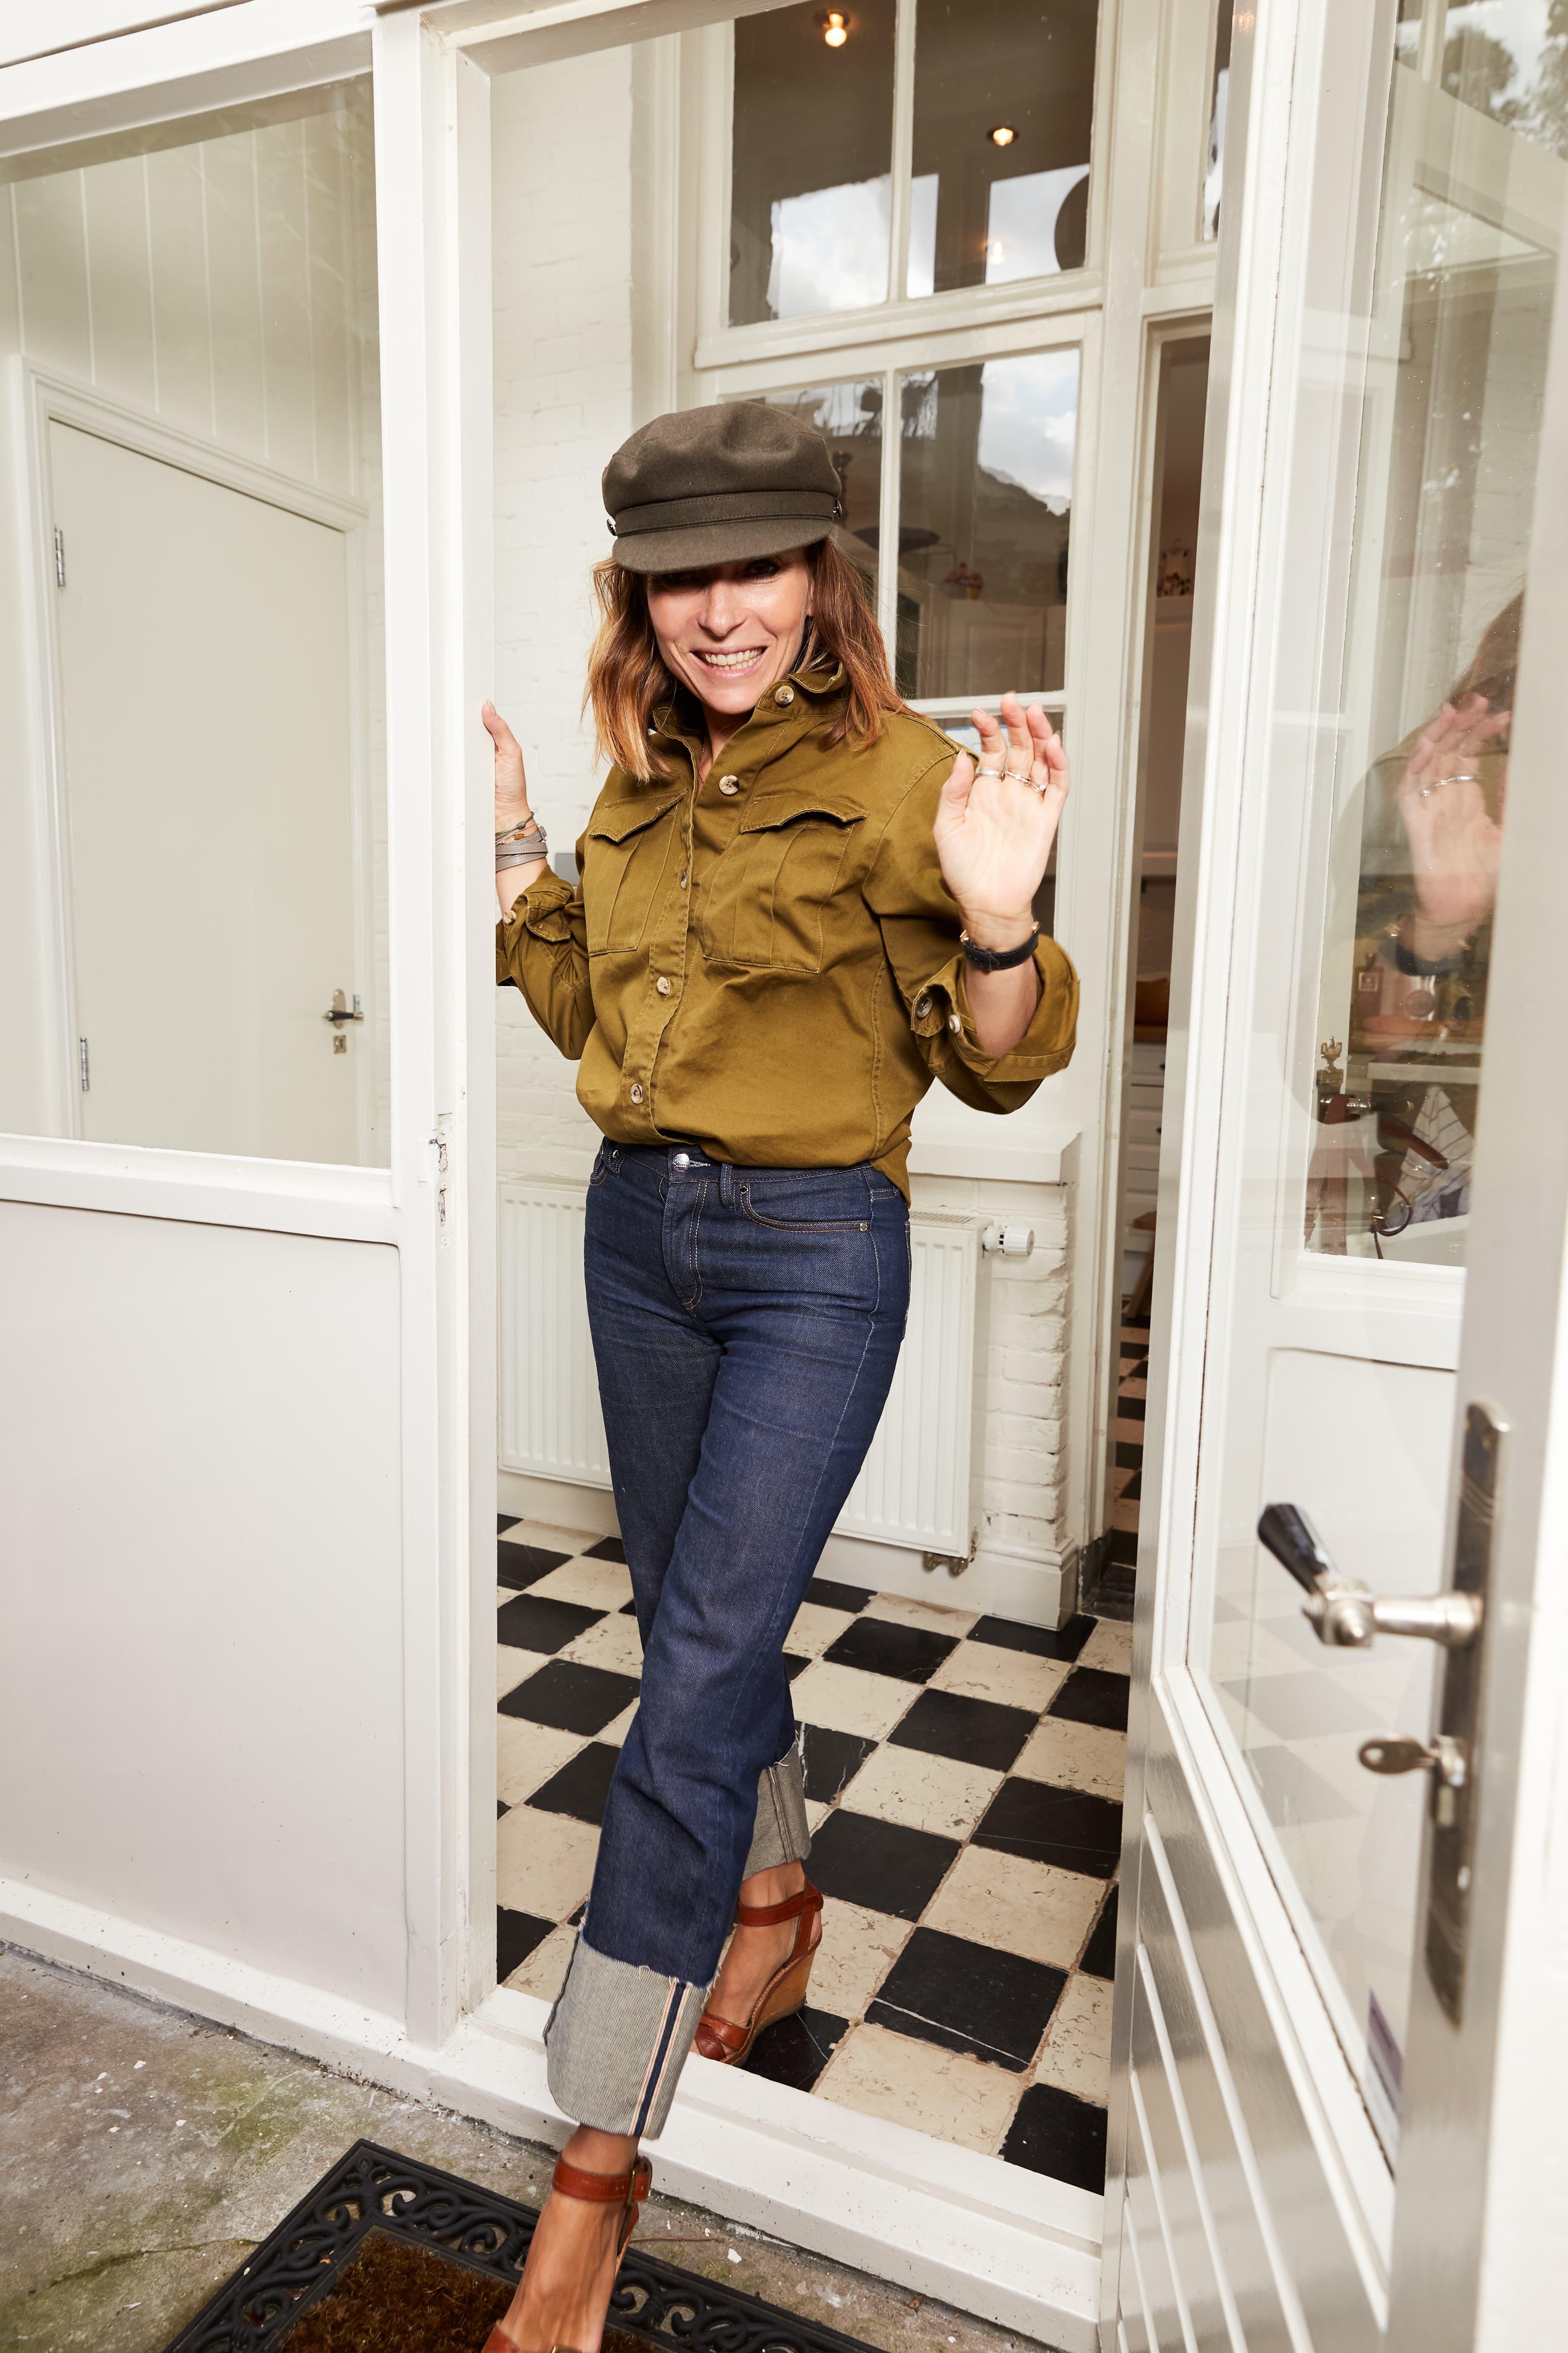 The Closet Of May-Britt Mobach 7